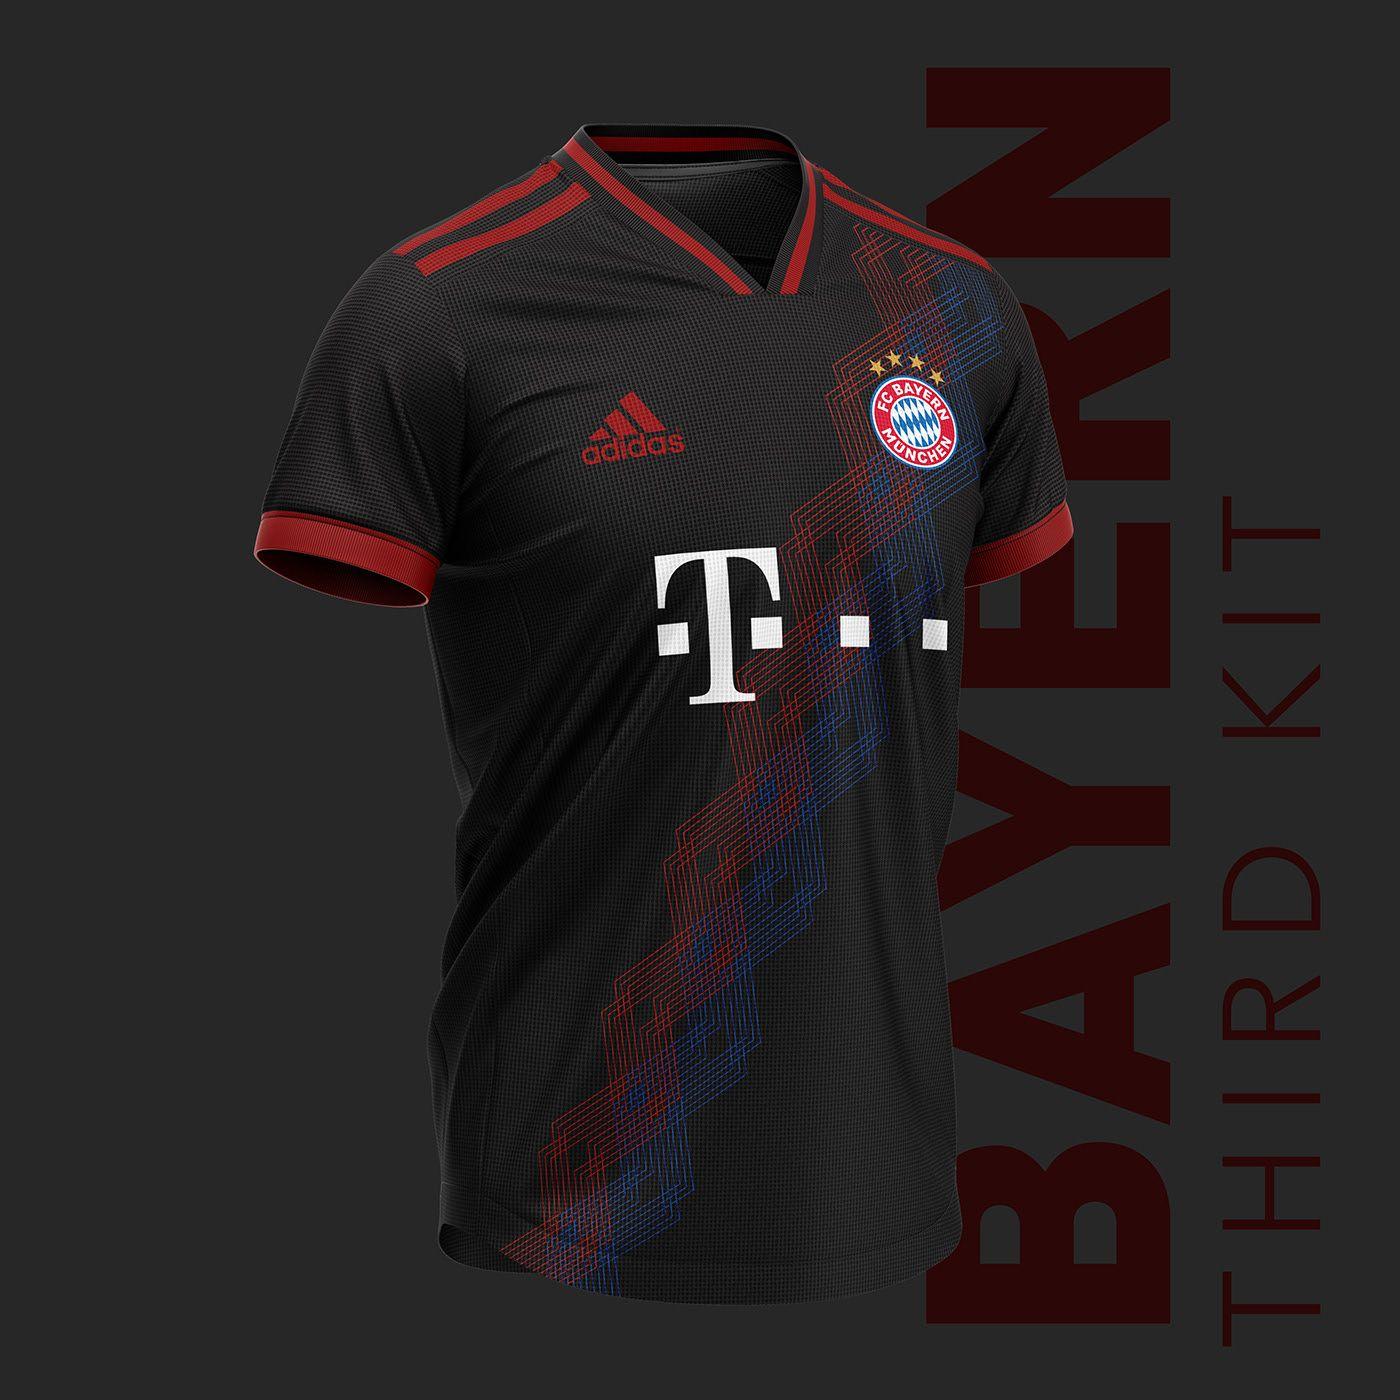 newest a9f8b f61cc Bayern München football kit 19/20. on Behance | Kit Concept 2